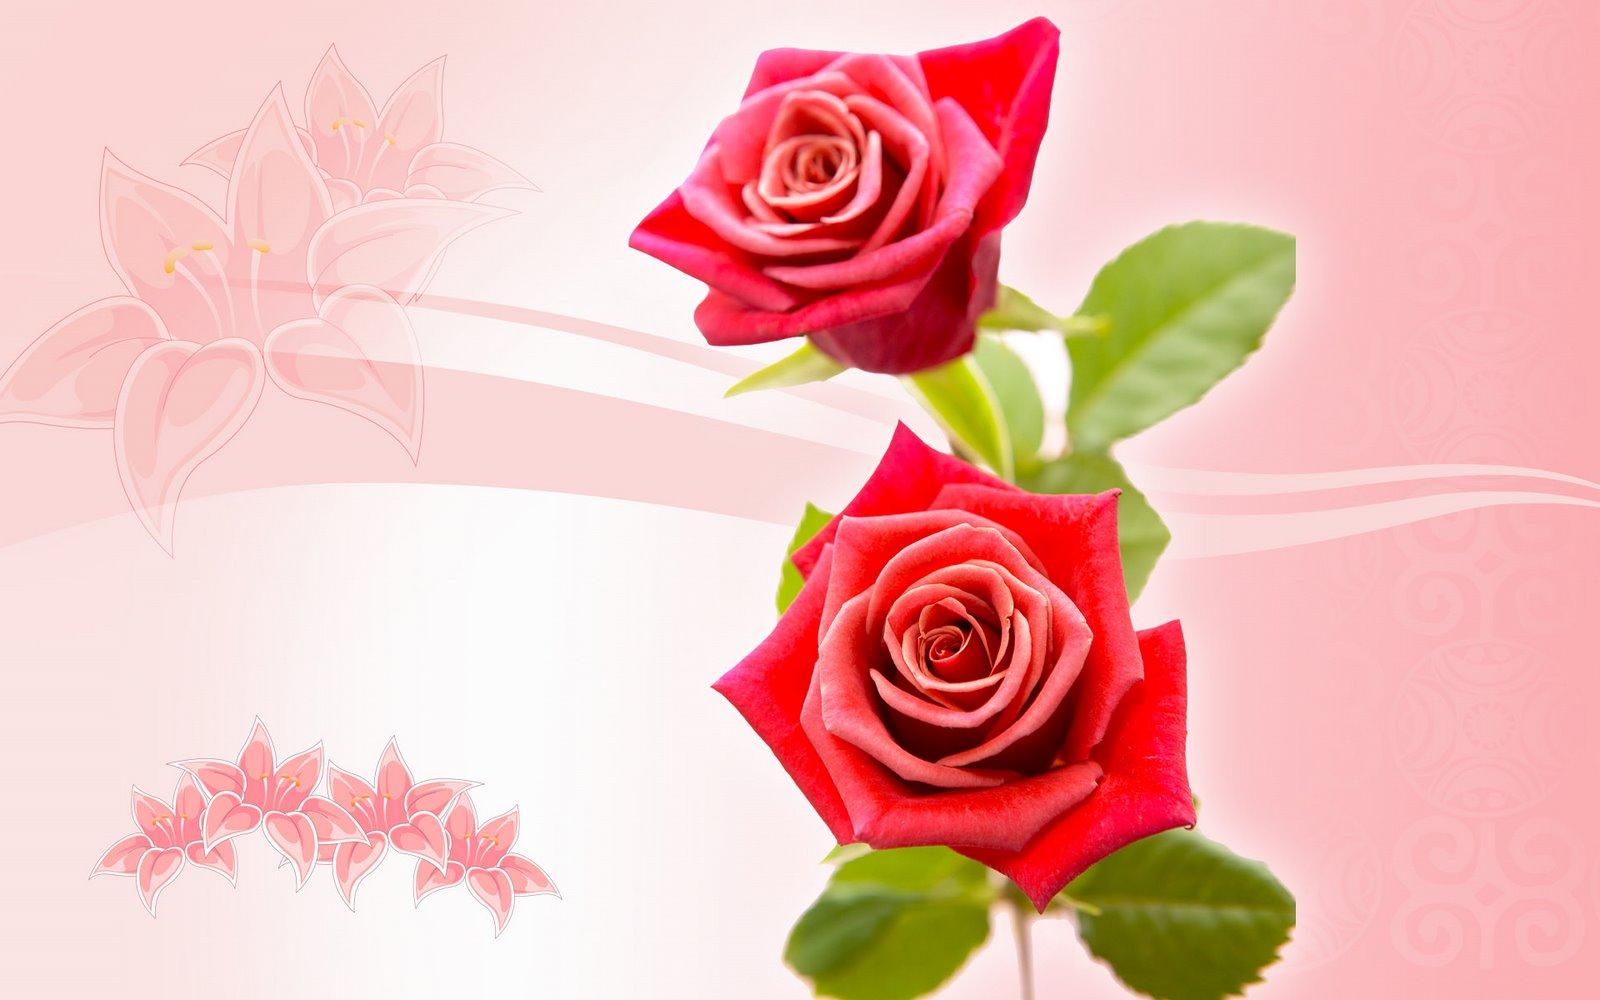 Imagenes Rosas Para El Dia De La Madre}